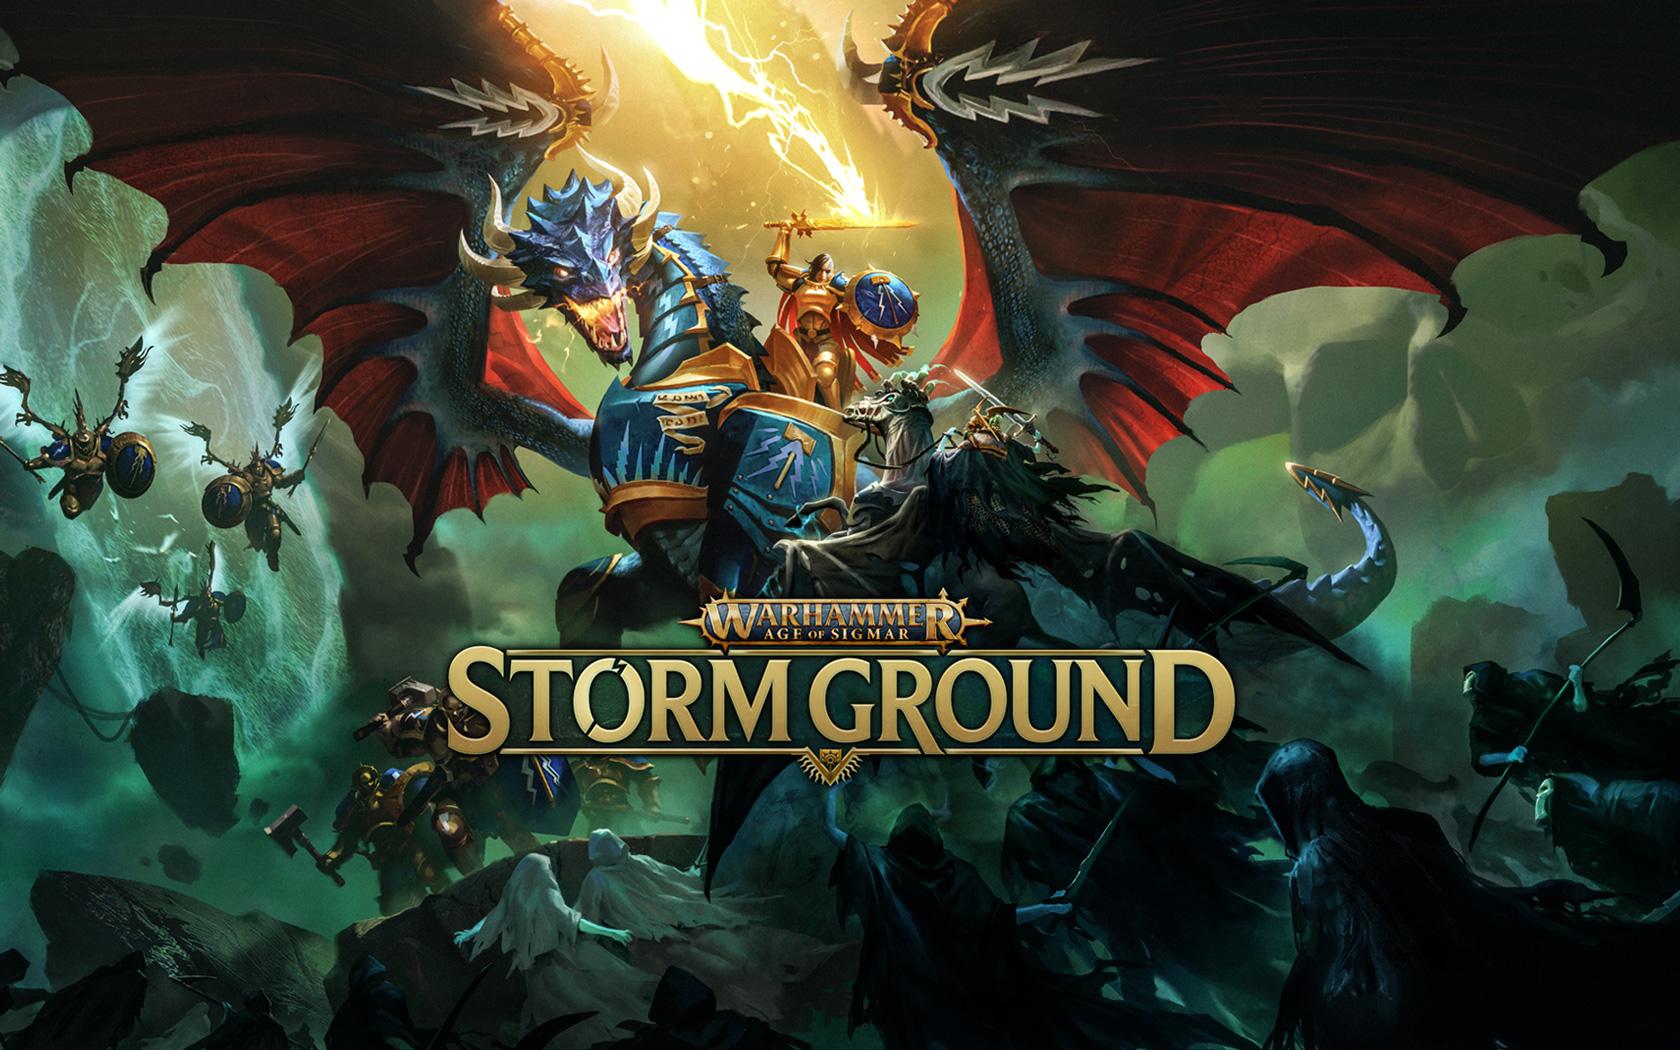 Free Warhammer Age of Sigmar: Storm Ground Wallpaper in 1680x1050